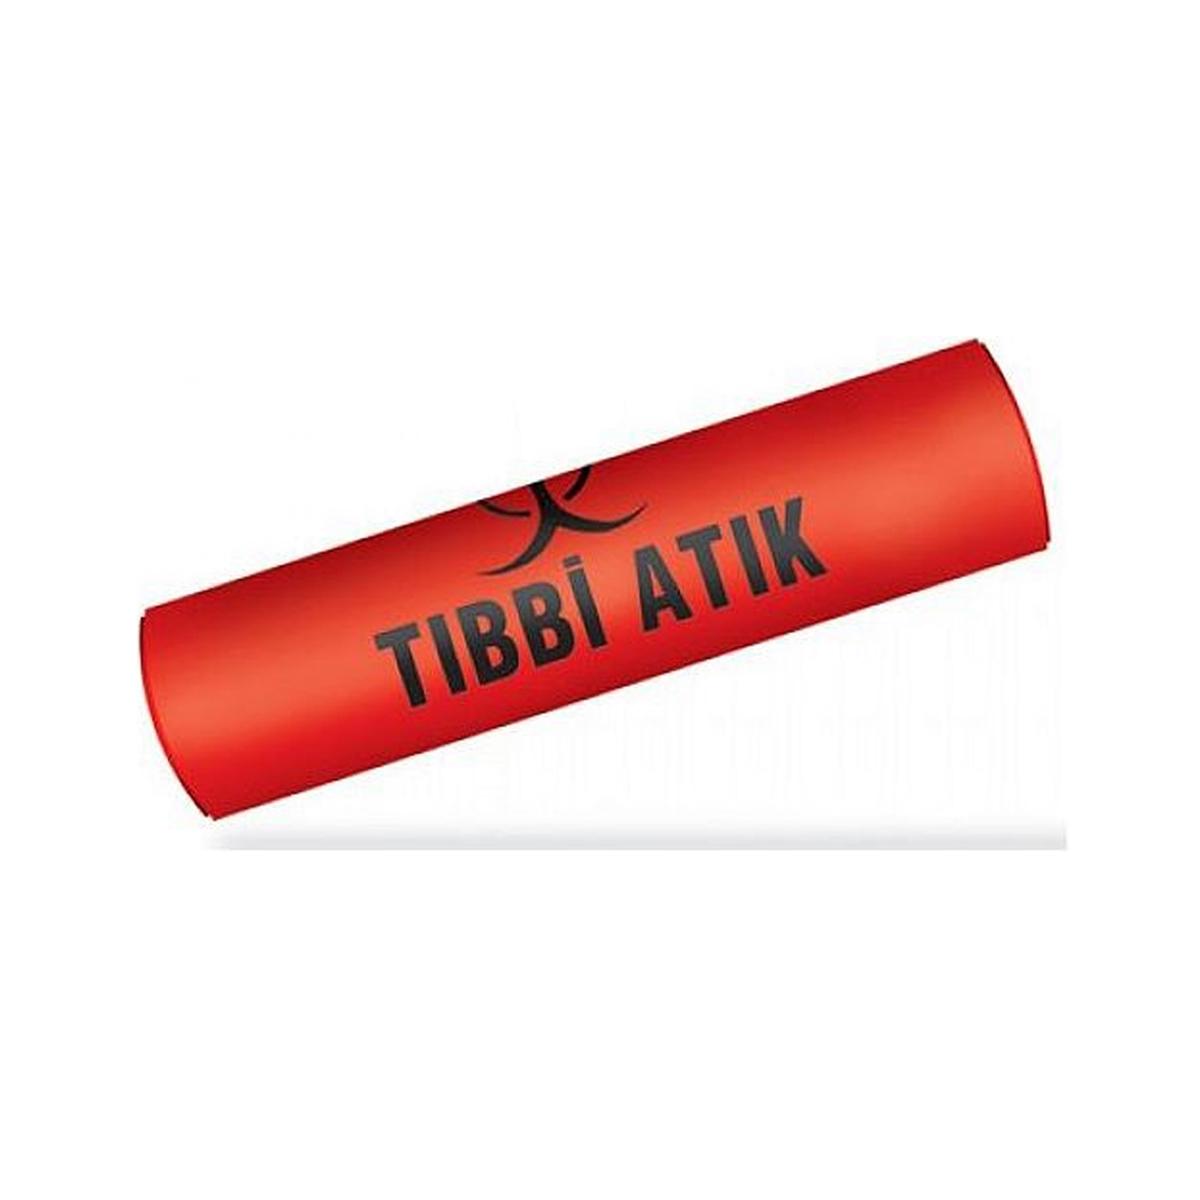 Koroplast Tıbbı Atık Çöp Torbası Battal Boy 72x95 cm Kırmızı 10RL*10AD resmi